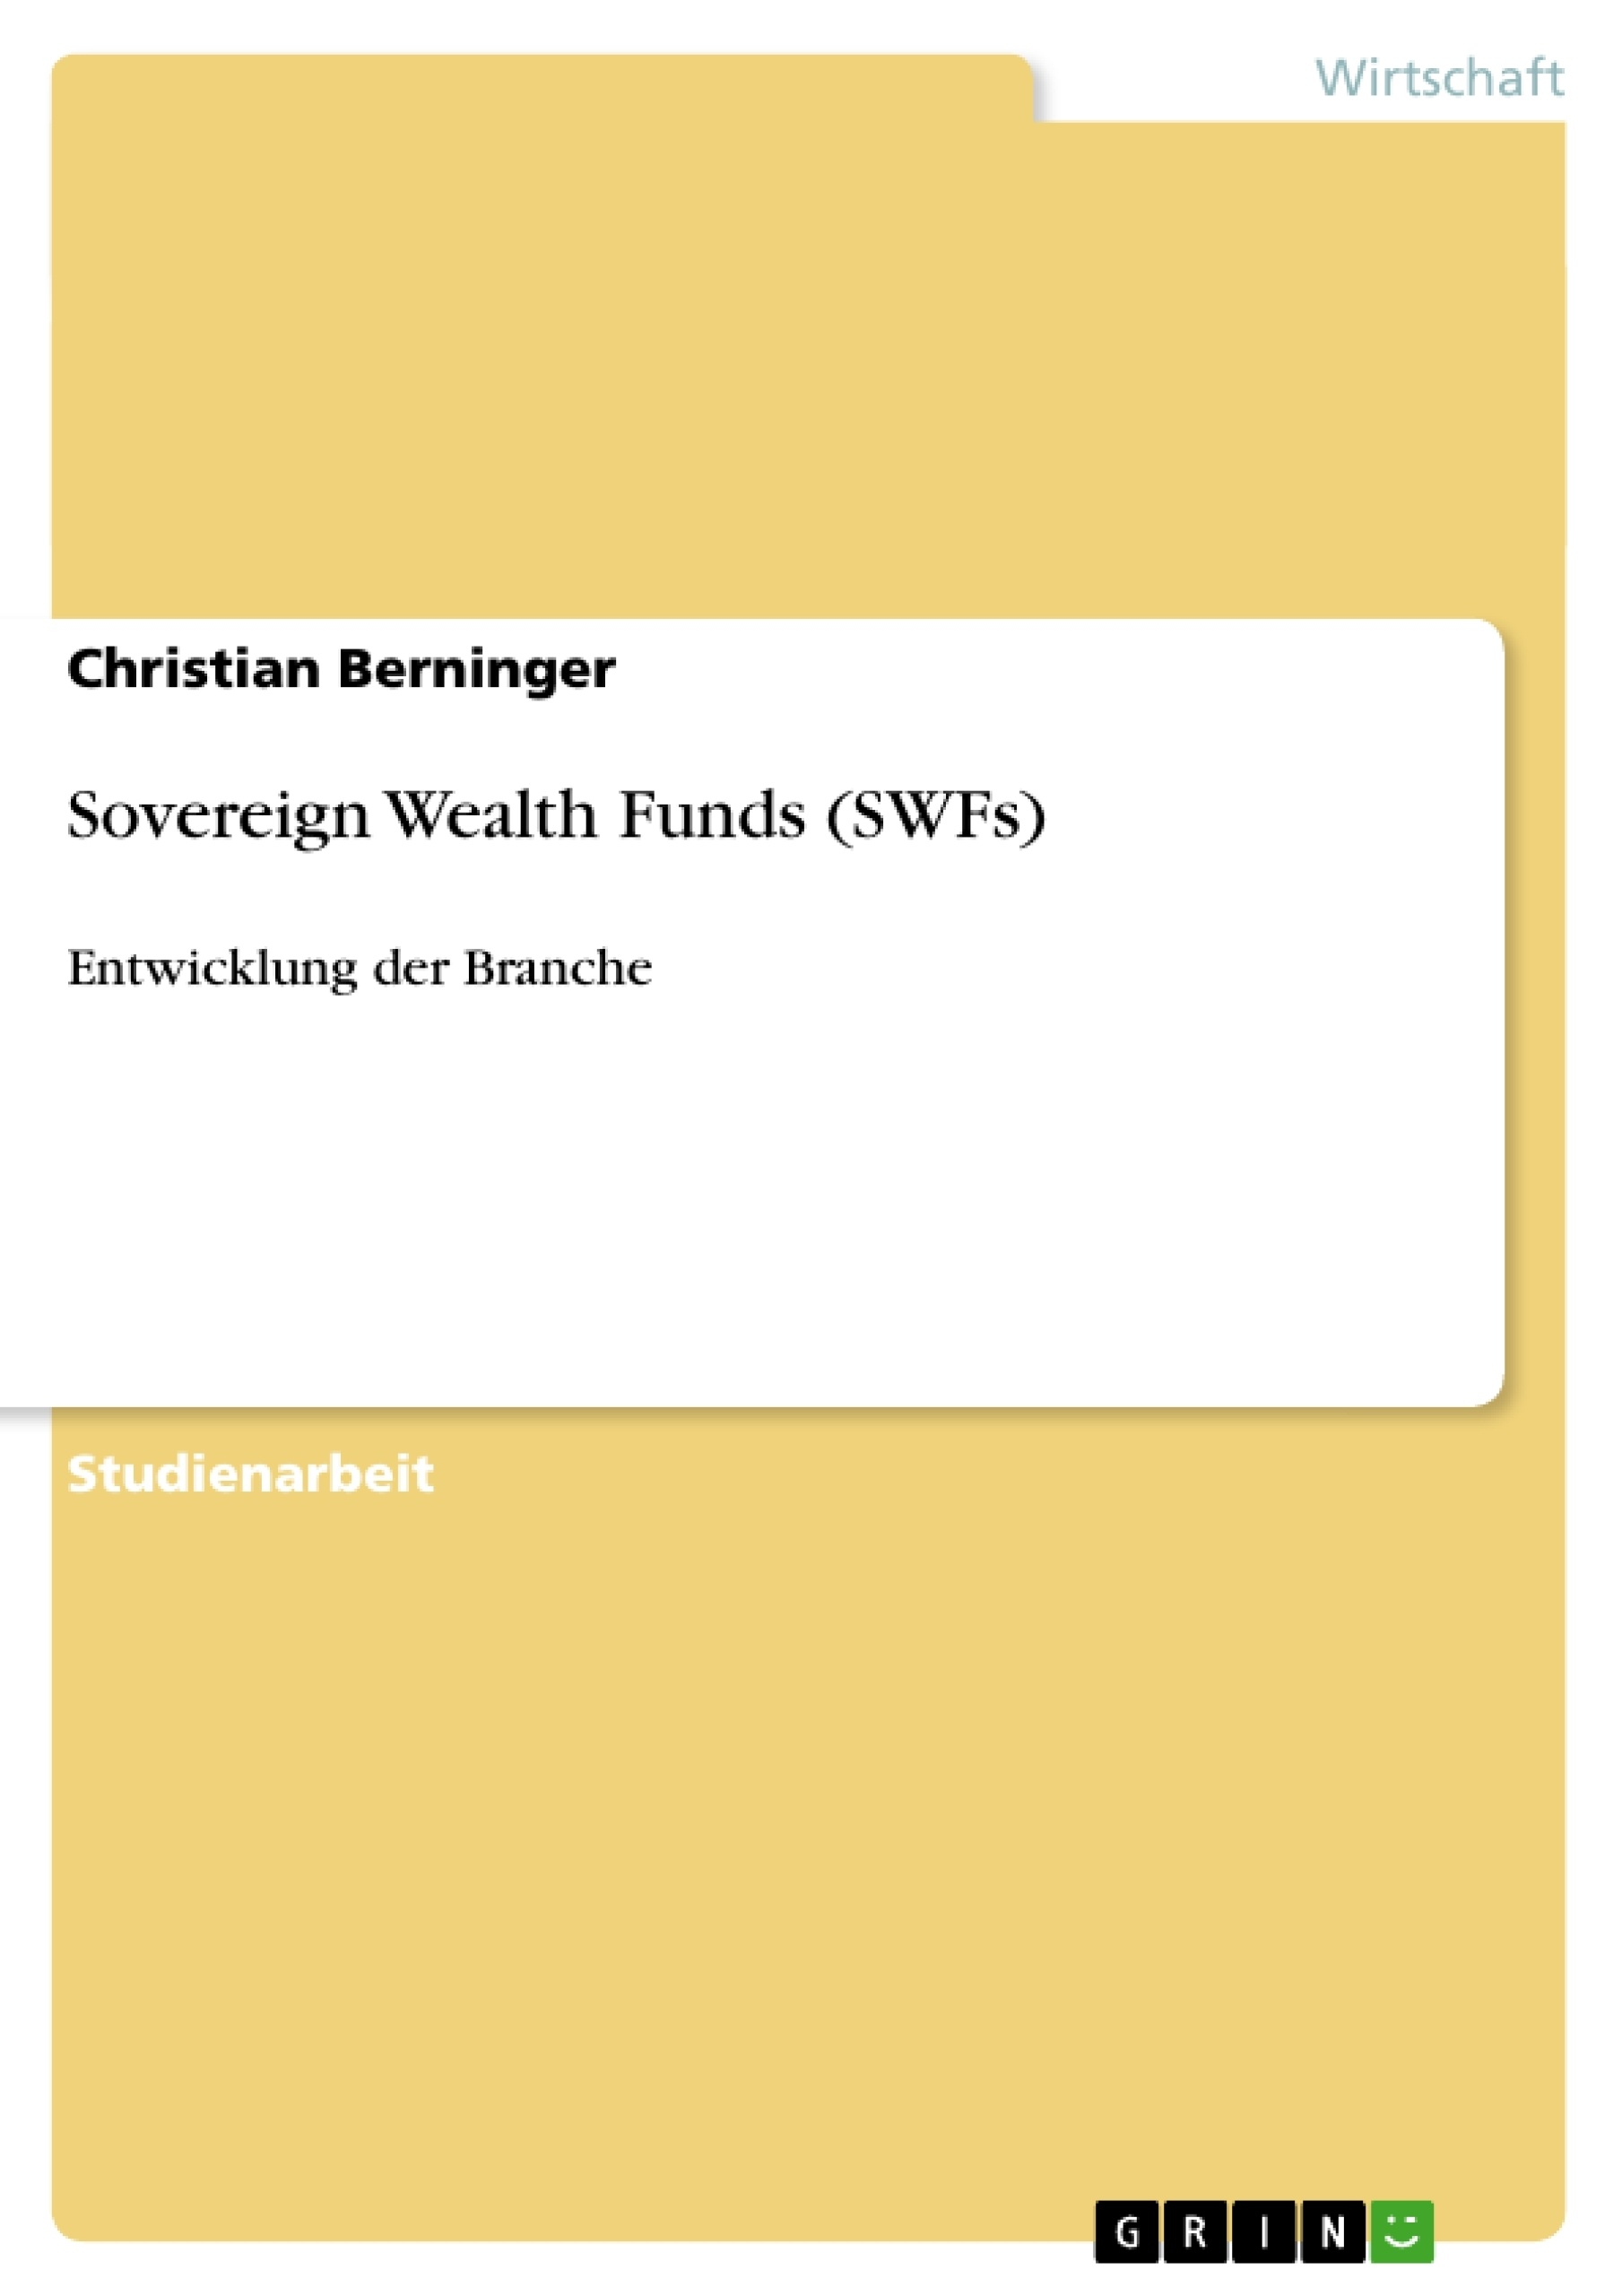 Titel: Sovereign Wealth Funds (SWFs)